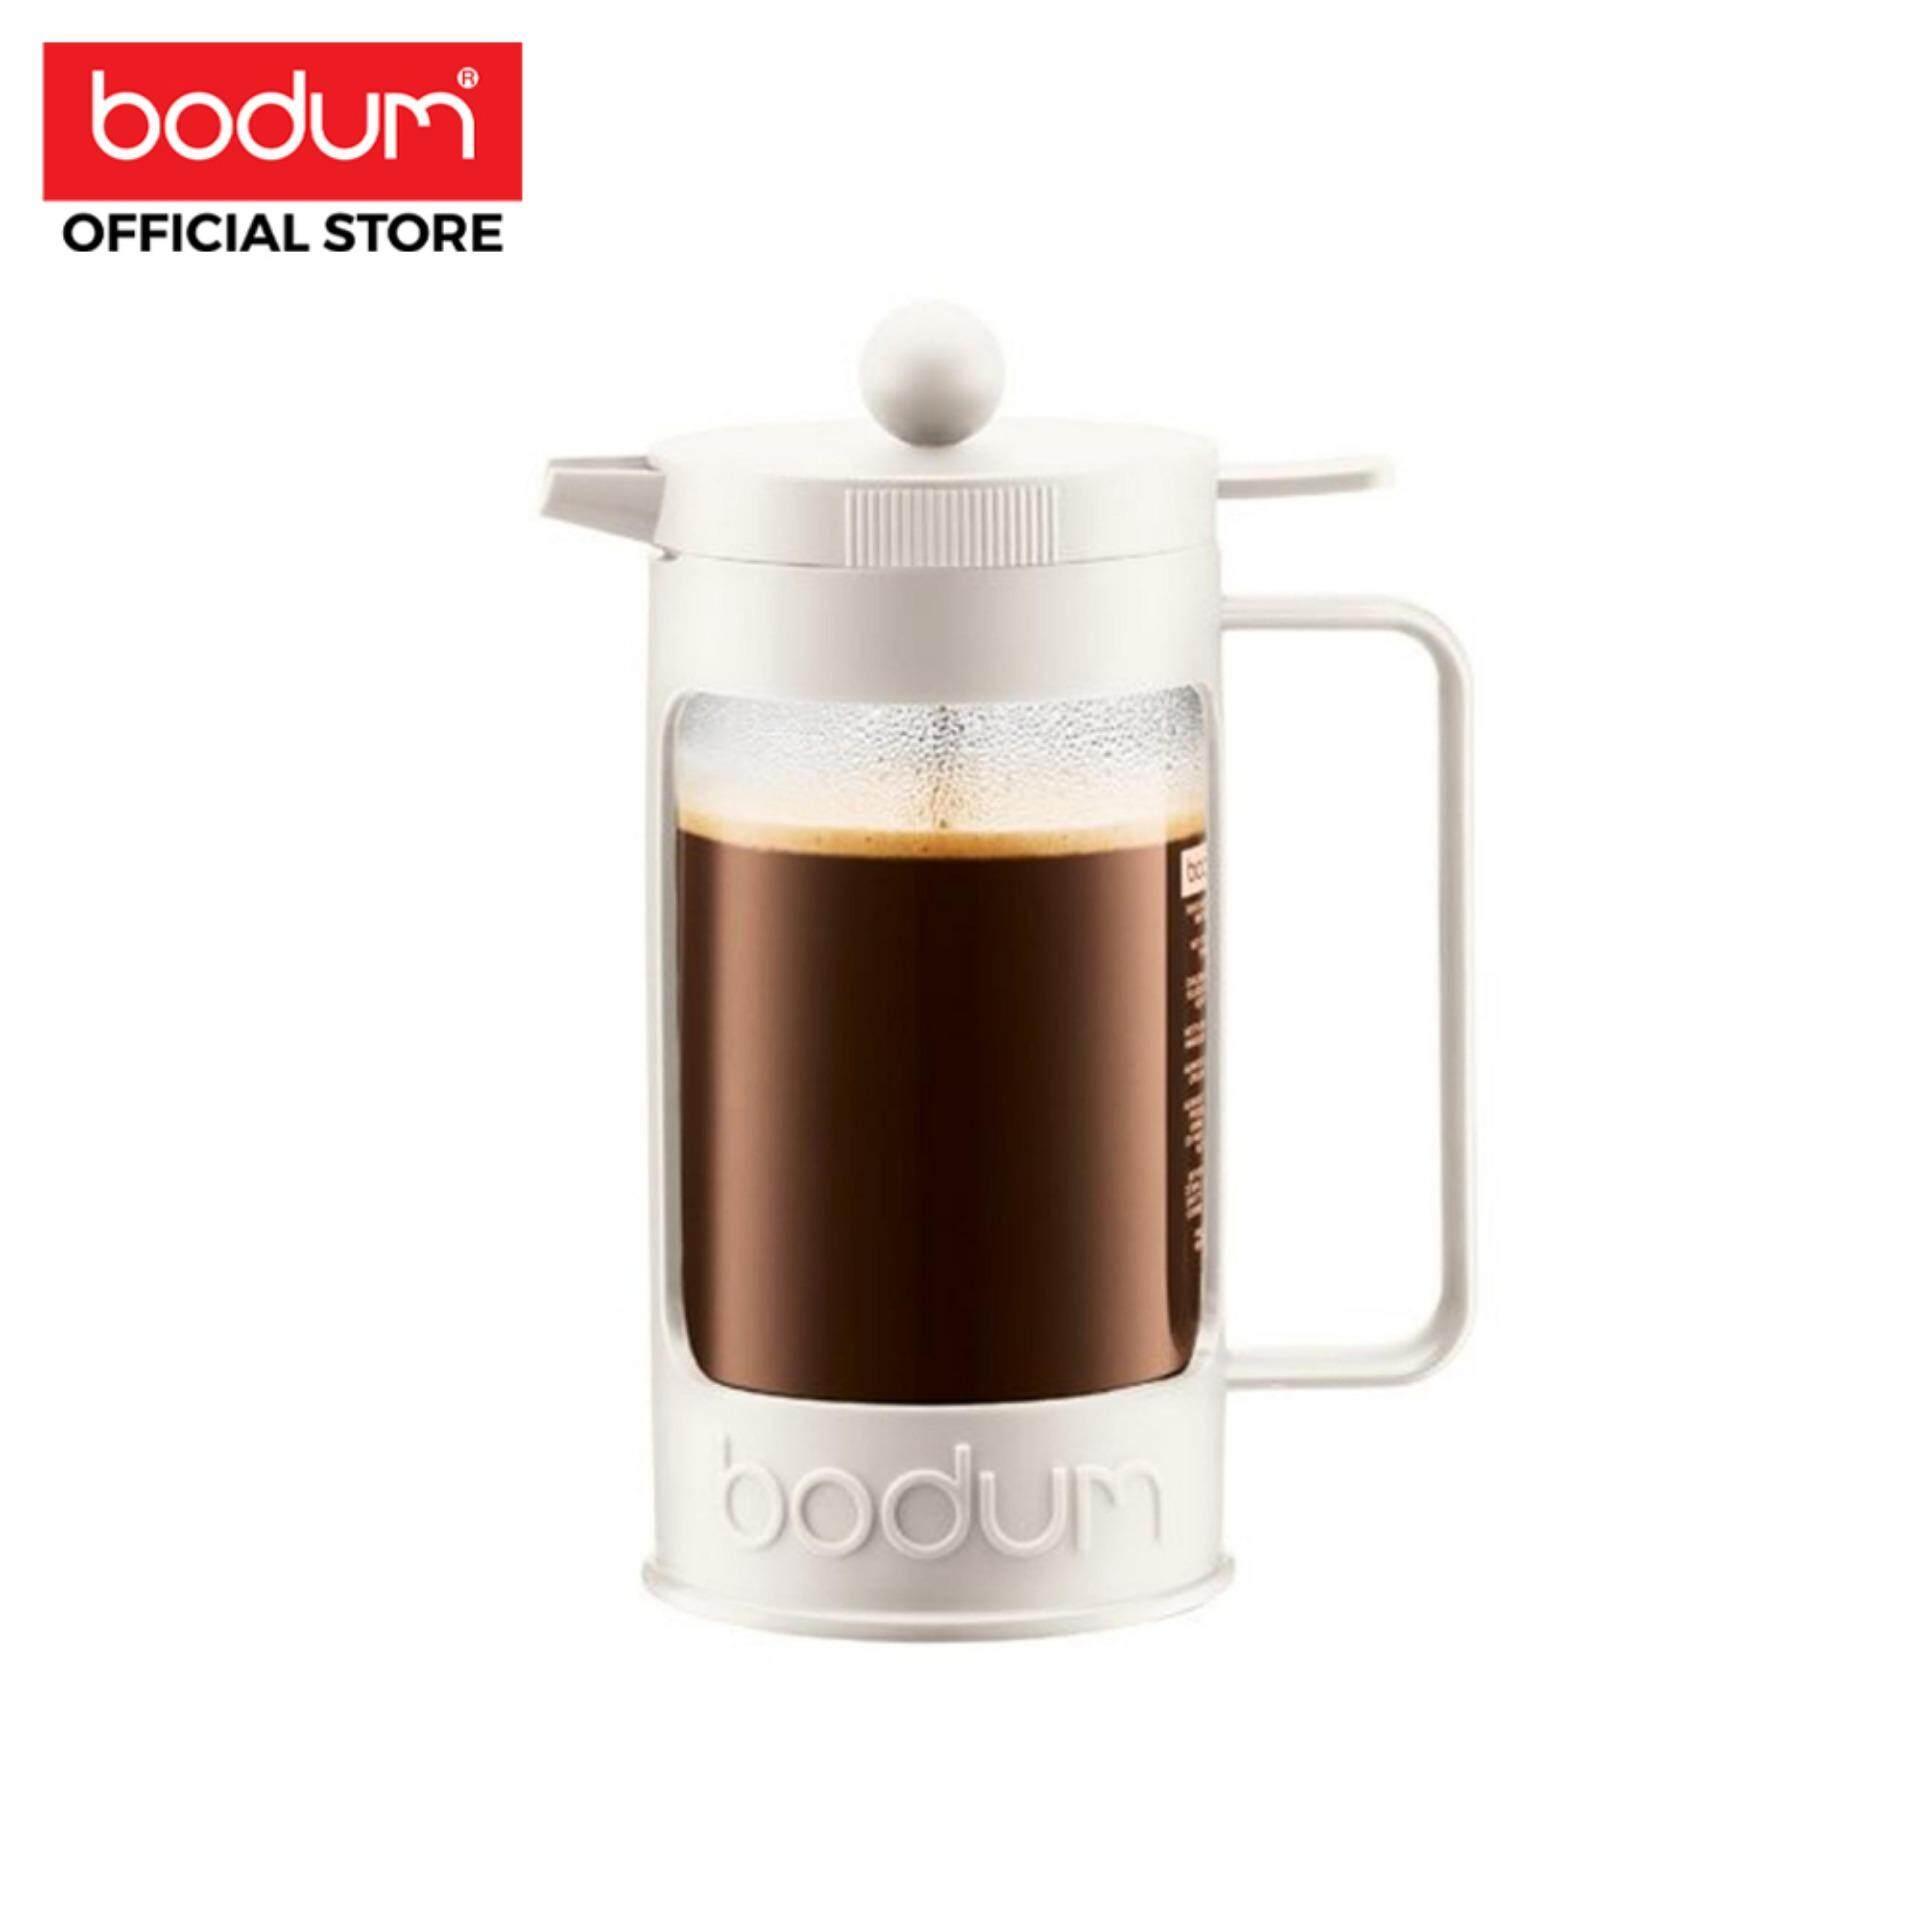 Bodum เครื่องชงกาแฟ Bean  French Press - 8 Cup  34 ออนซ์ สีขาว.